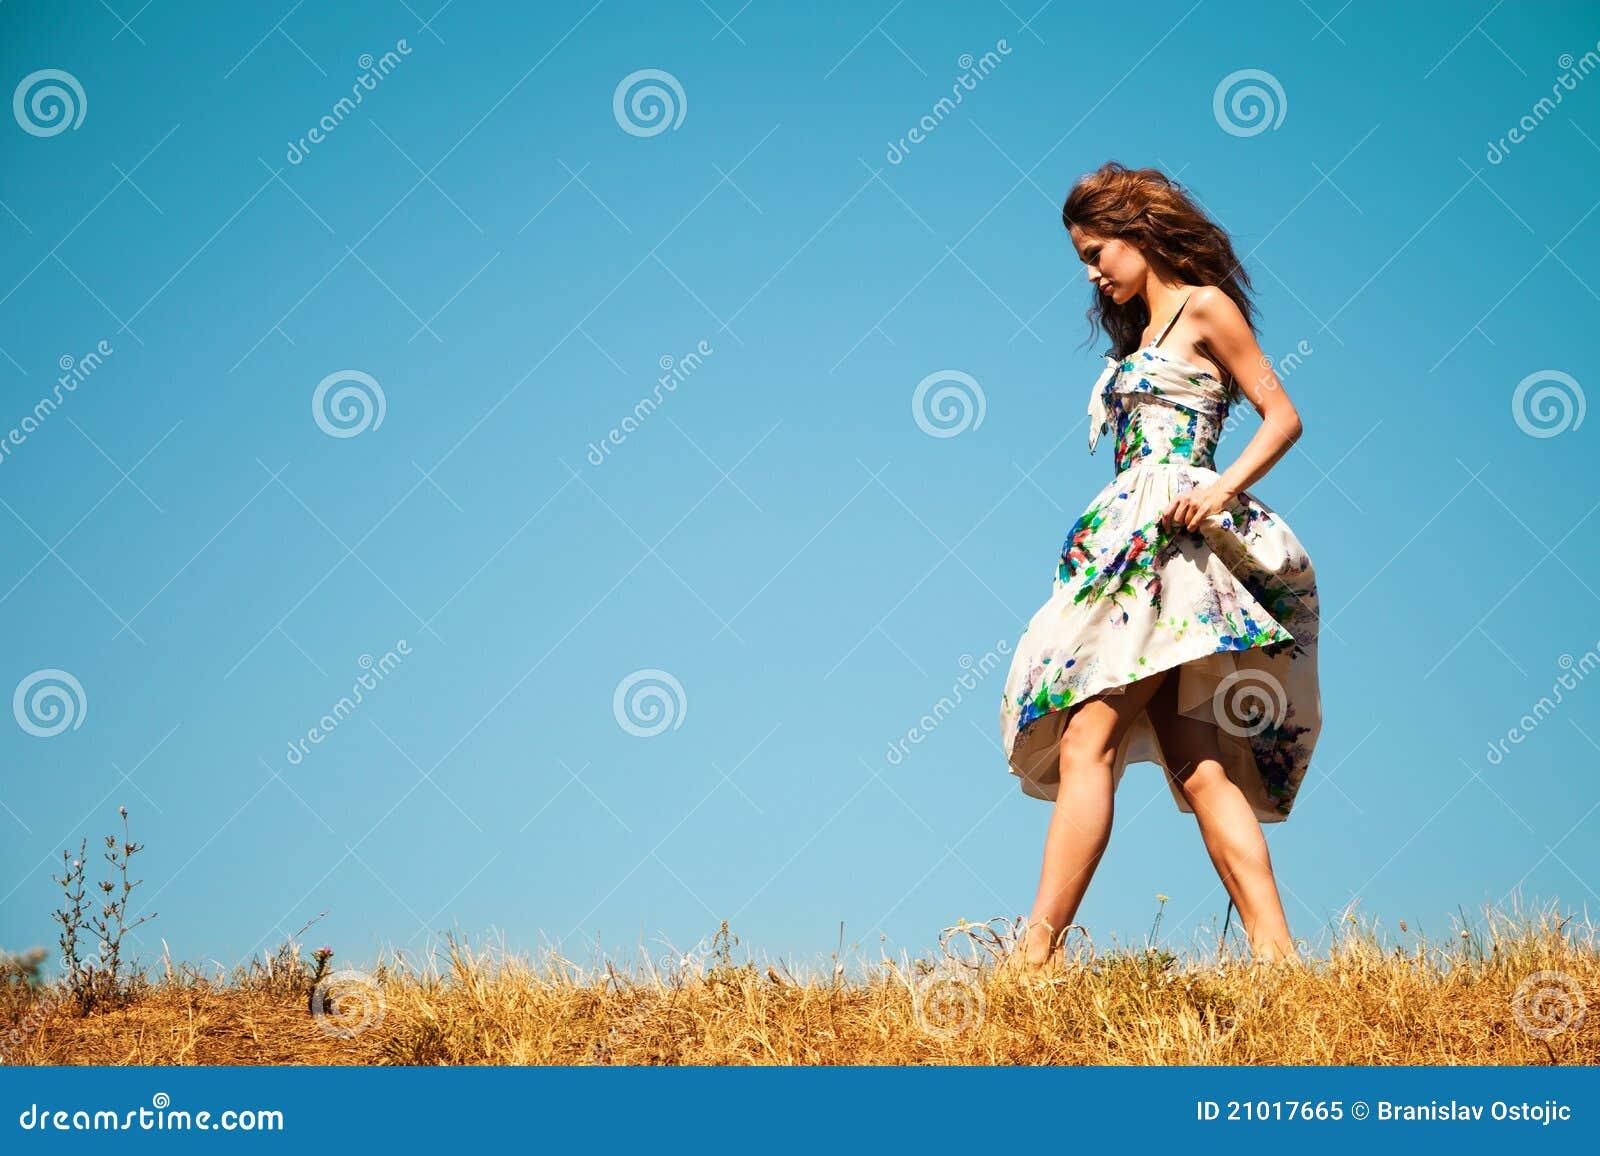 woman walking in grass - photo #3